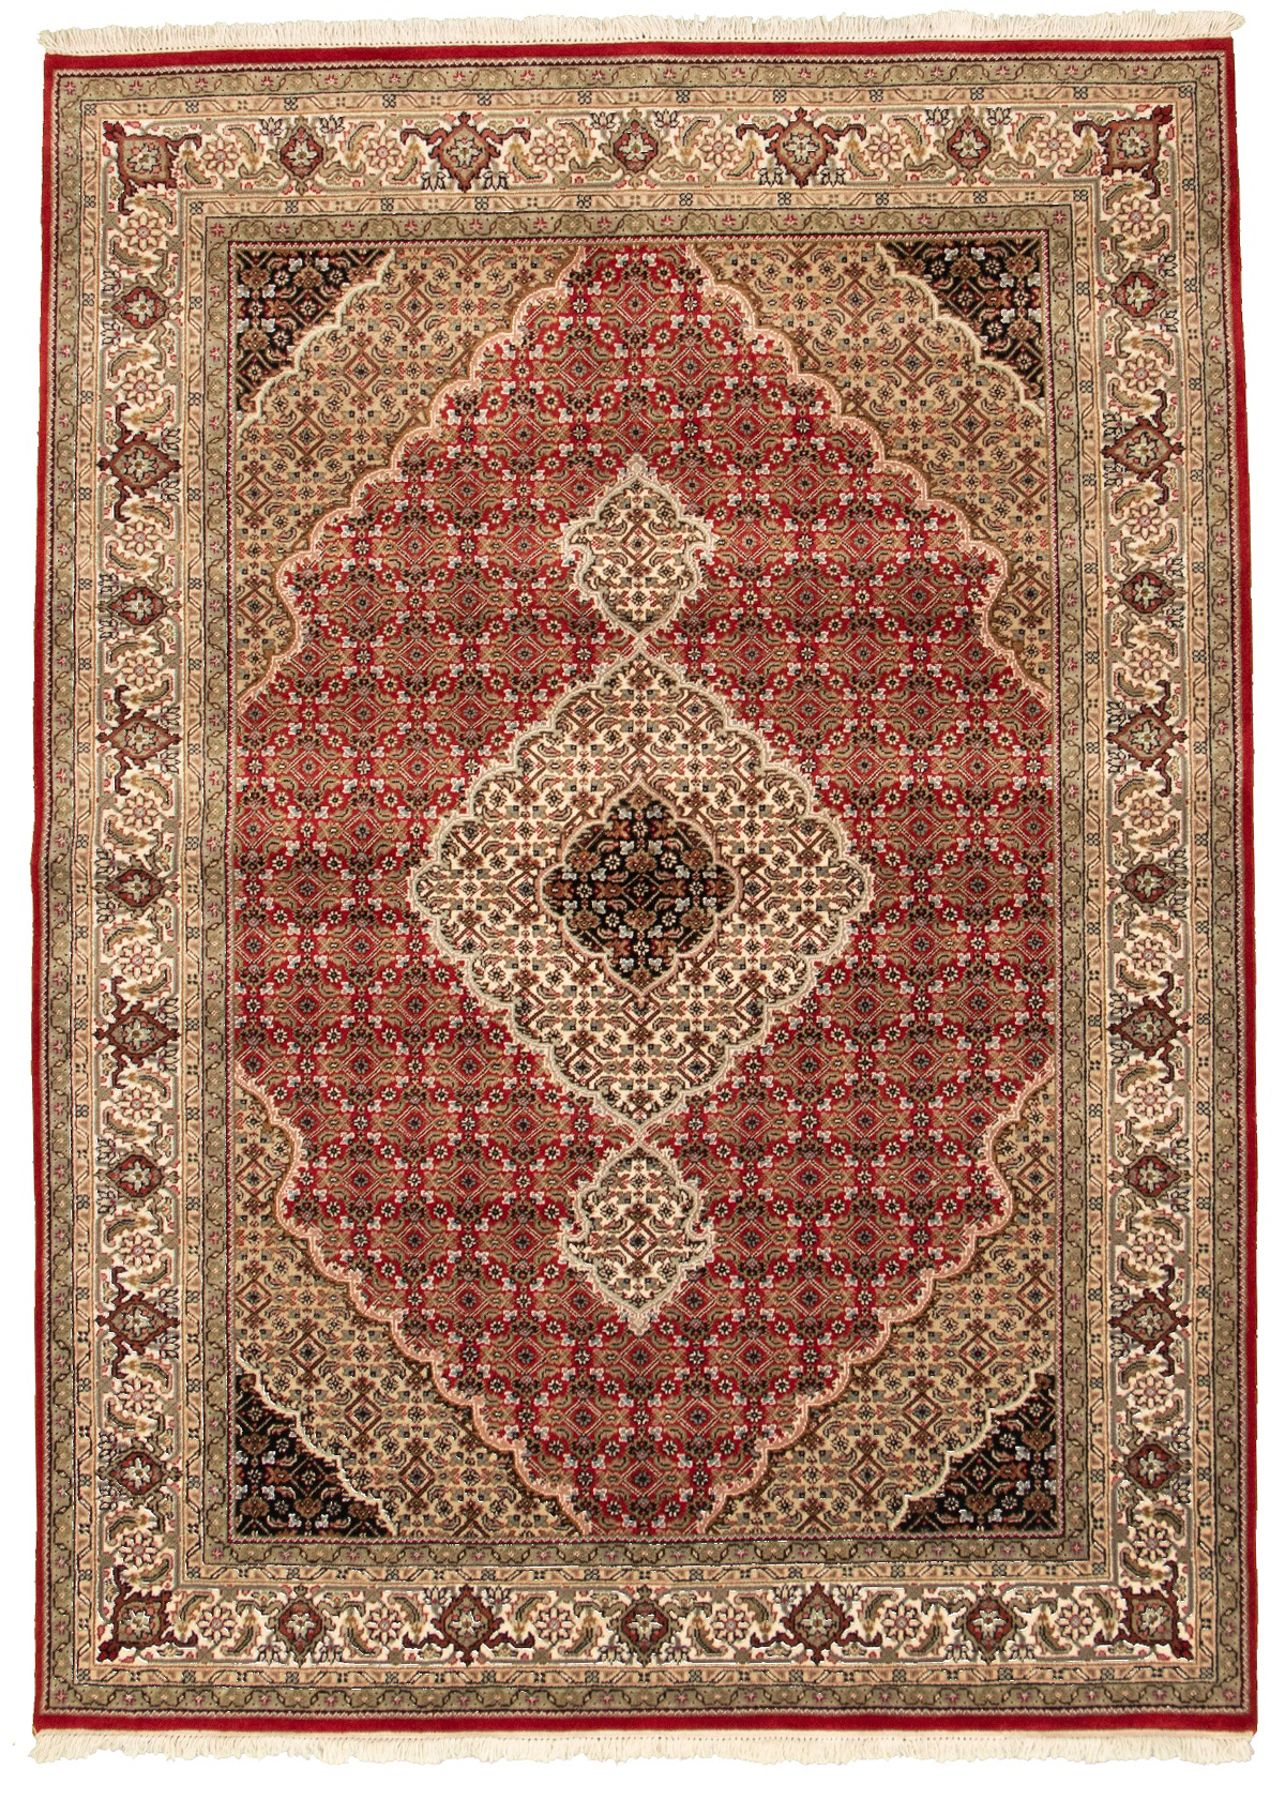 "Hand-knotted Tabriz Haj Jalili Red Wool Rug 5'9"" x 8'0"" Size: 5'9"" x 8'0"""